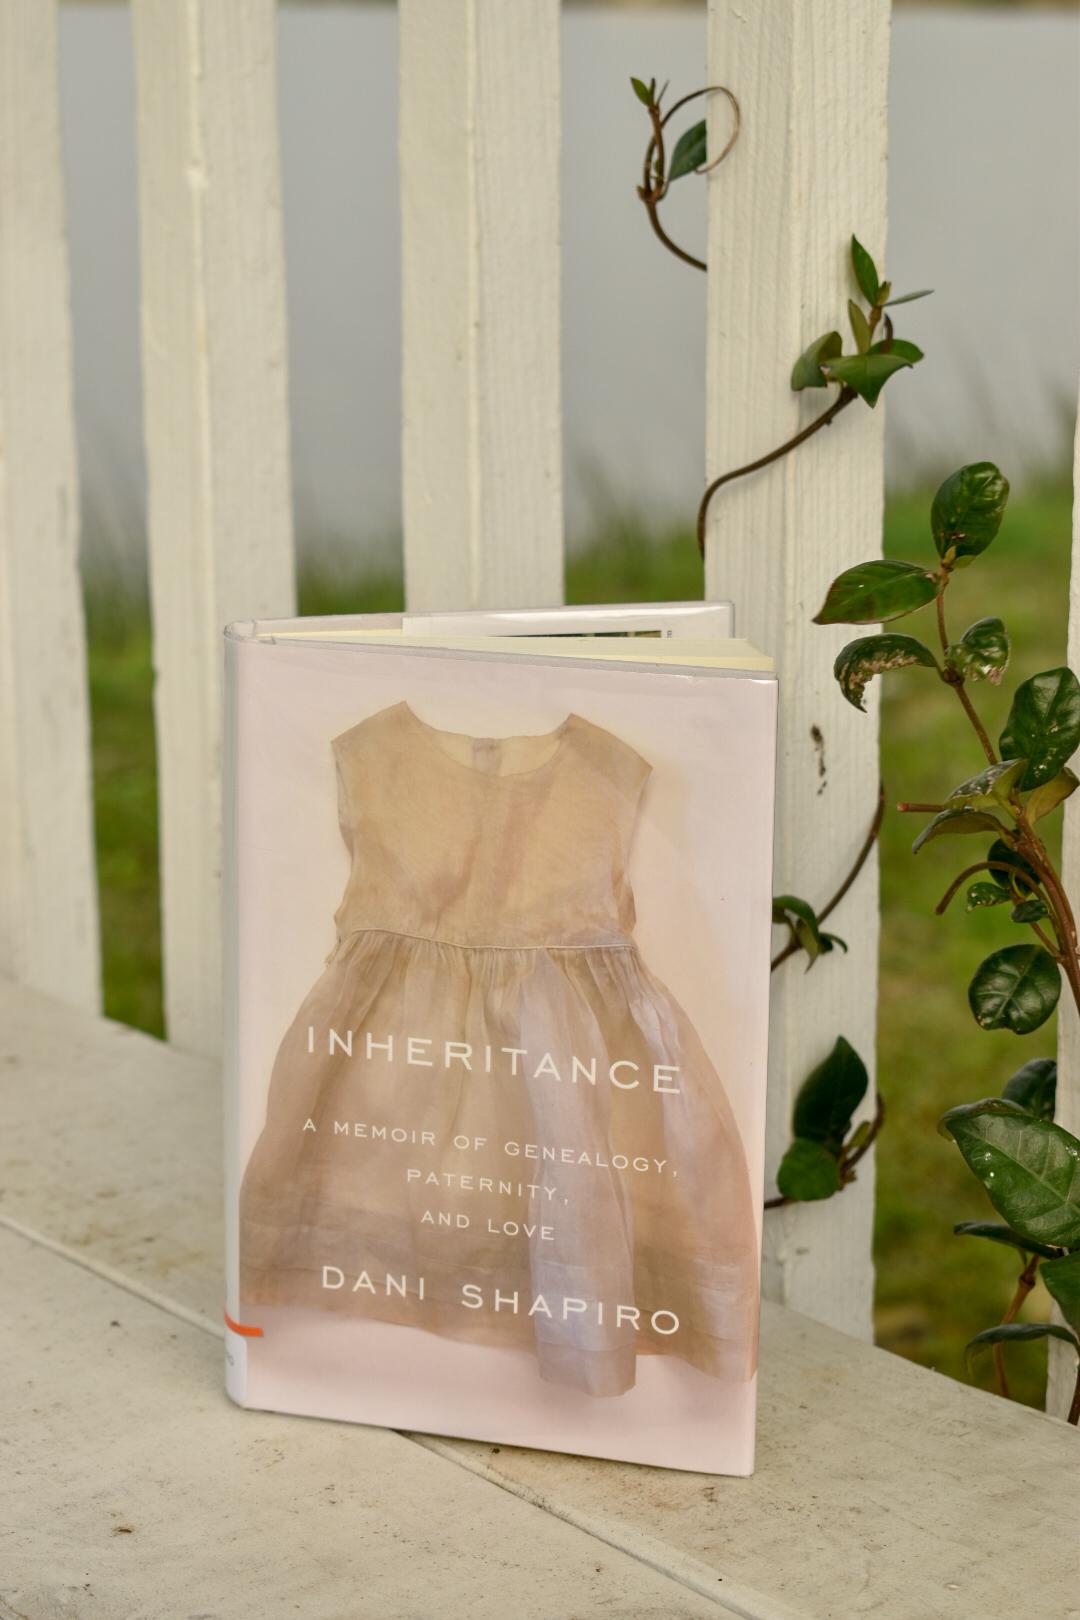 Inheritance A Memoir Of Genealogy Paternity And Love By Dani Shapiro